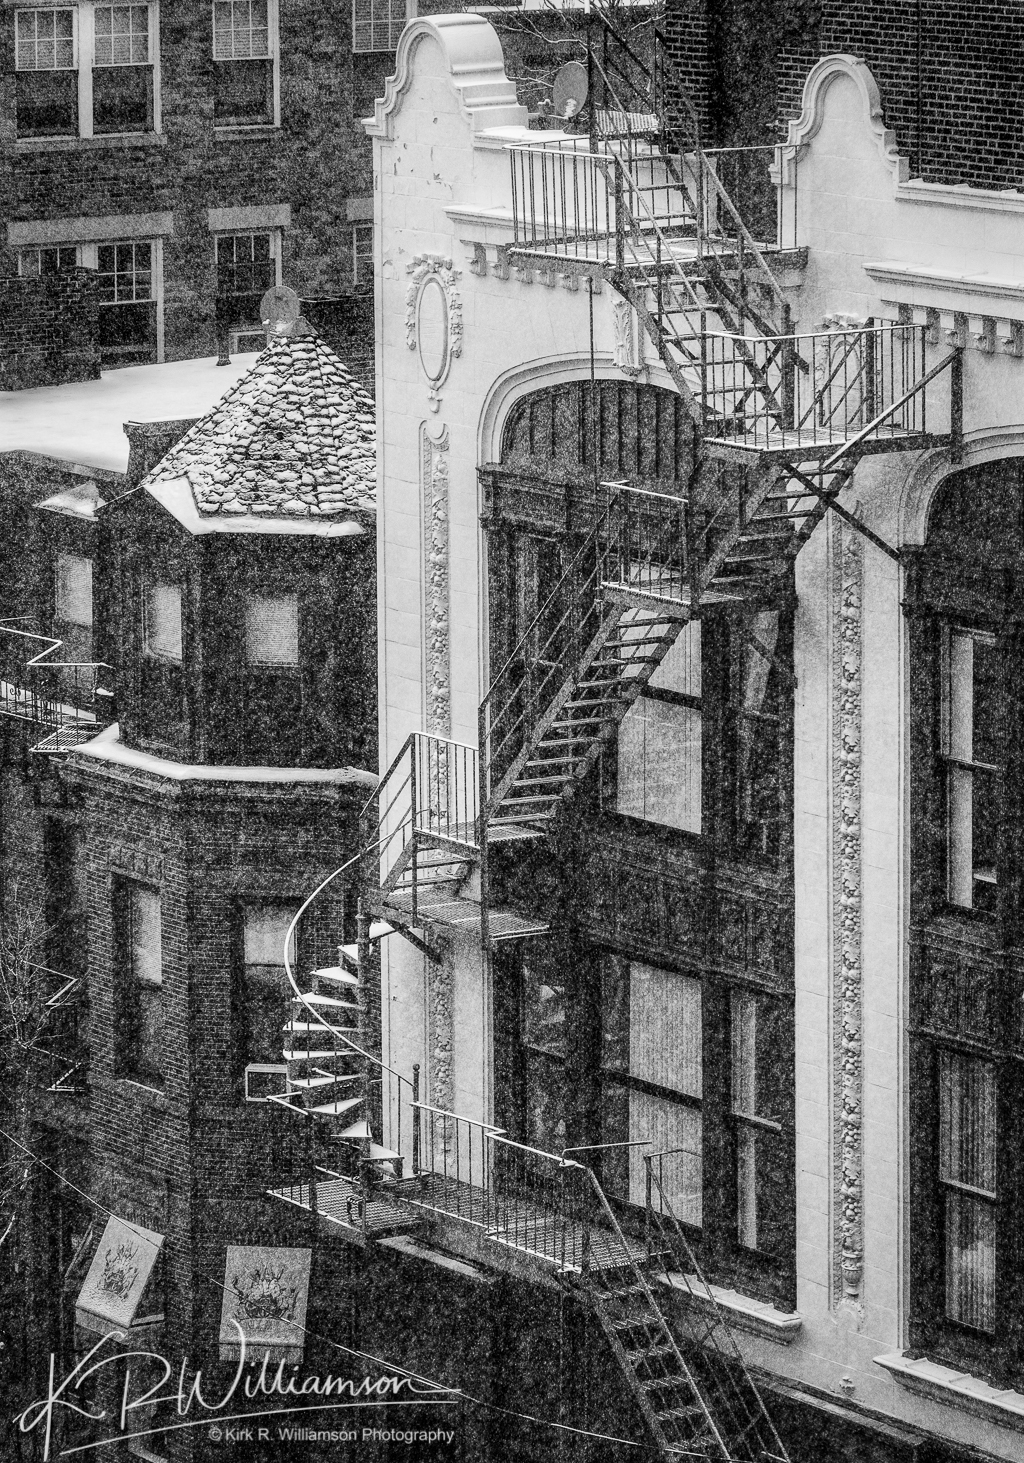 boston snow (1 of 1)